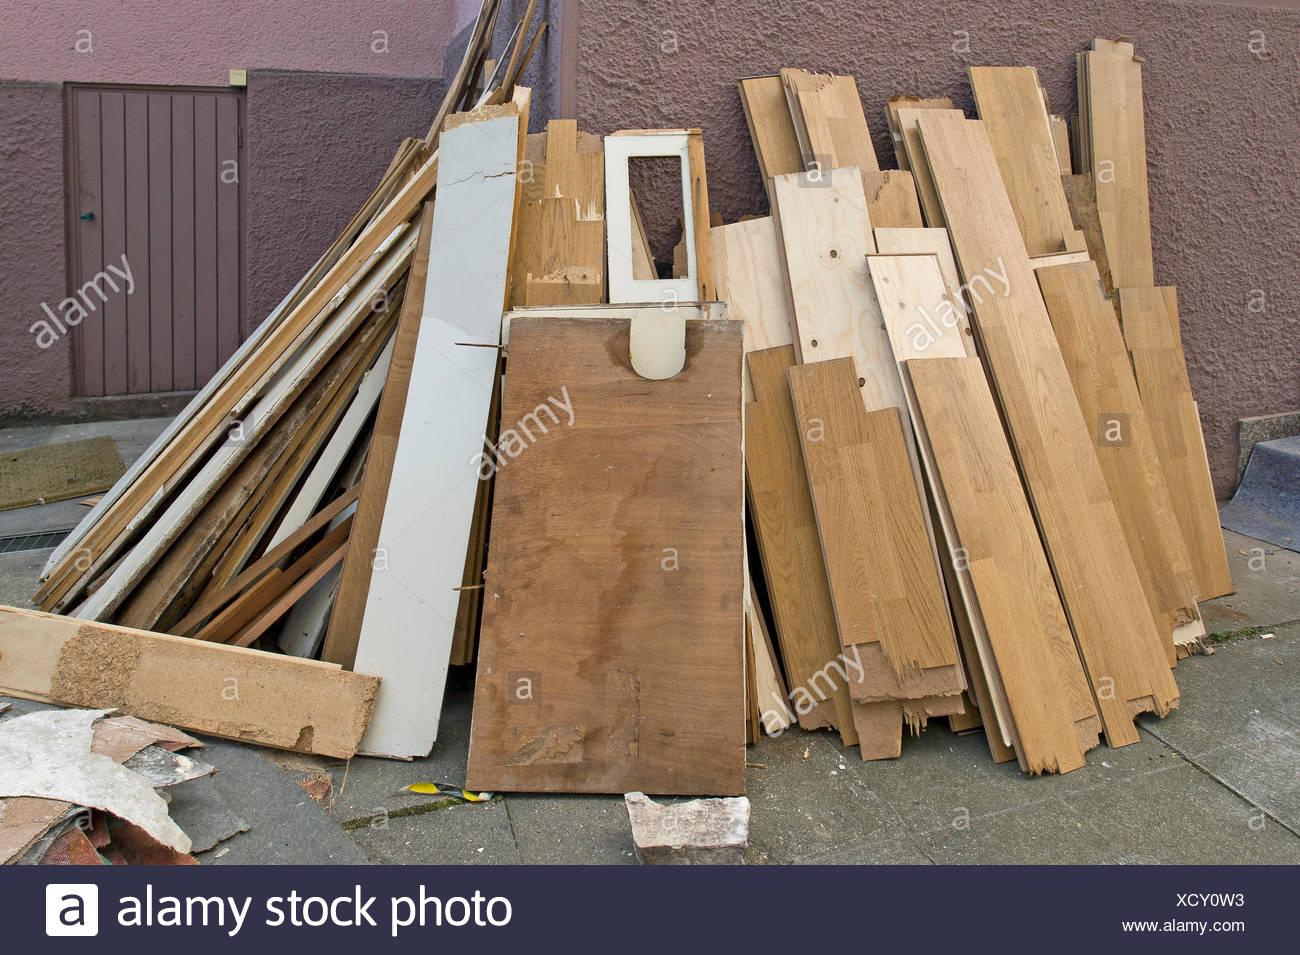 Boards, old parquet flooring, wood, garbage, Stuttgart, Baden-Wuerttemberg - Stock Image